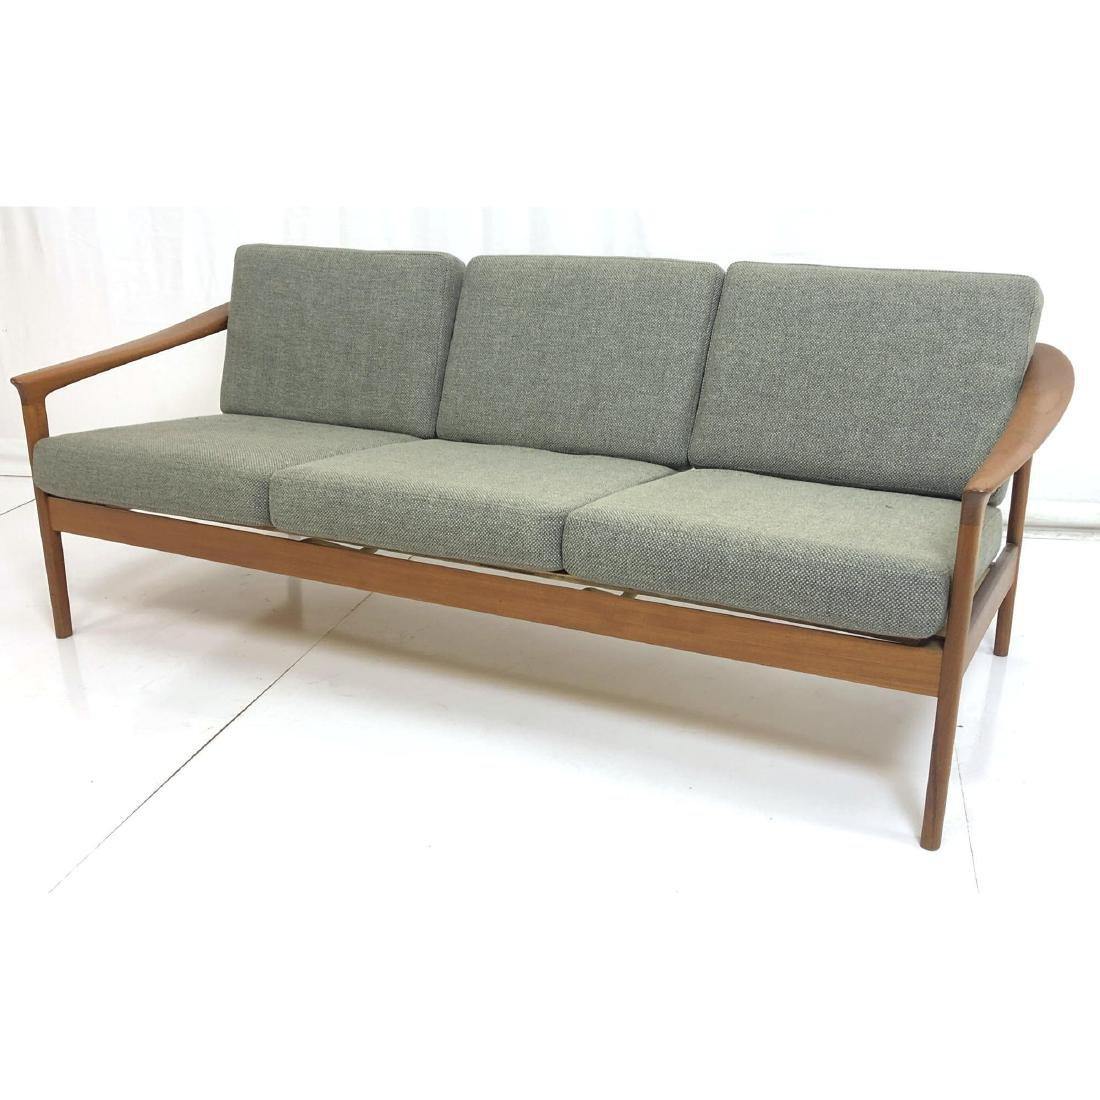 FOLKE OHLSSON Danish Modern Teak Sofa Couch . Ele